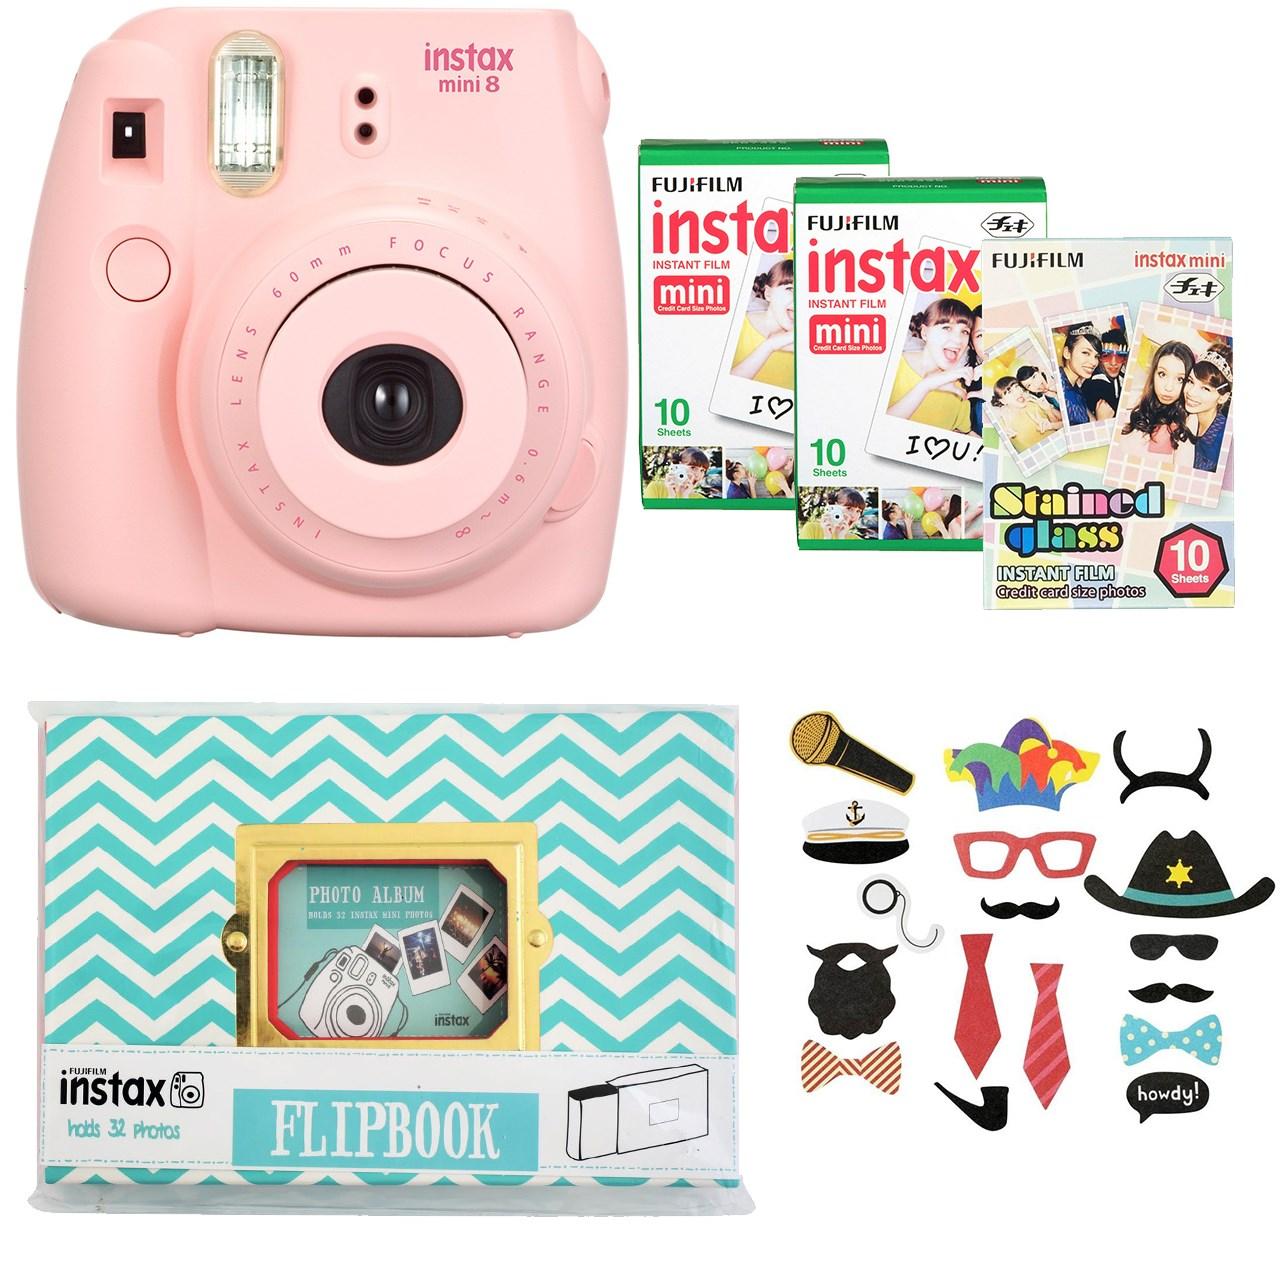 دوربين عکاسي چاپ سريع فوجي فیلم مدل Fujifilm Instax Mini 8 Digital Camera With Flipbook, 3 Films And Photo Stickers